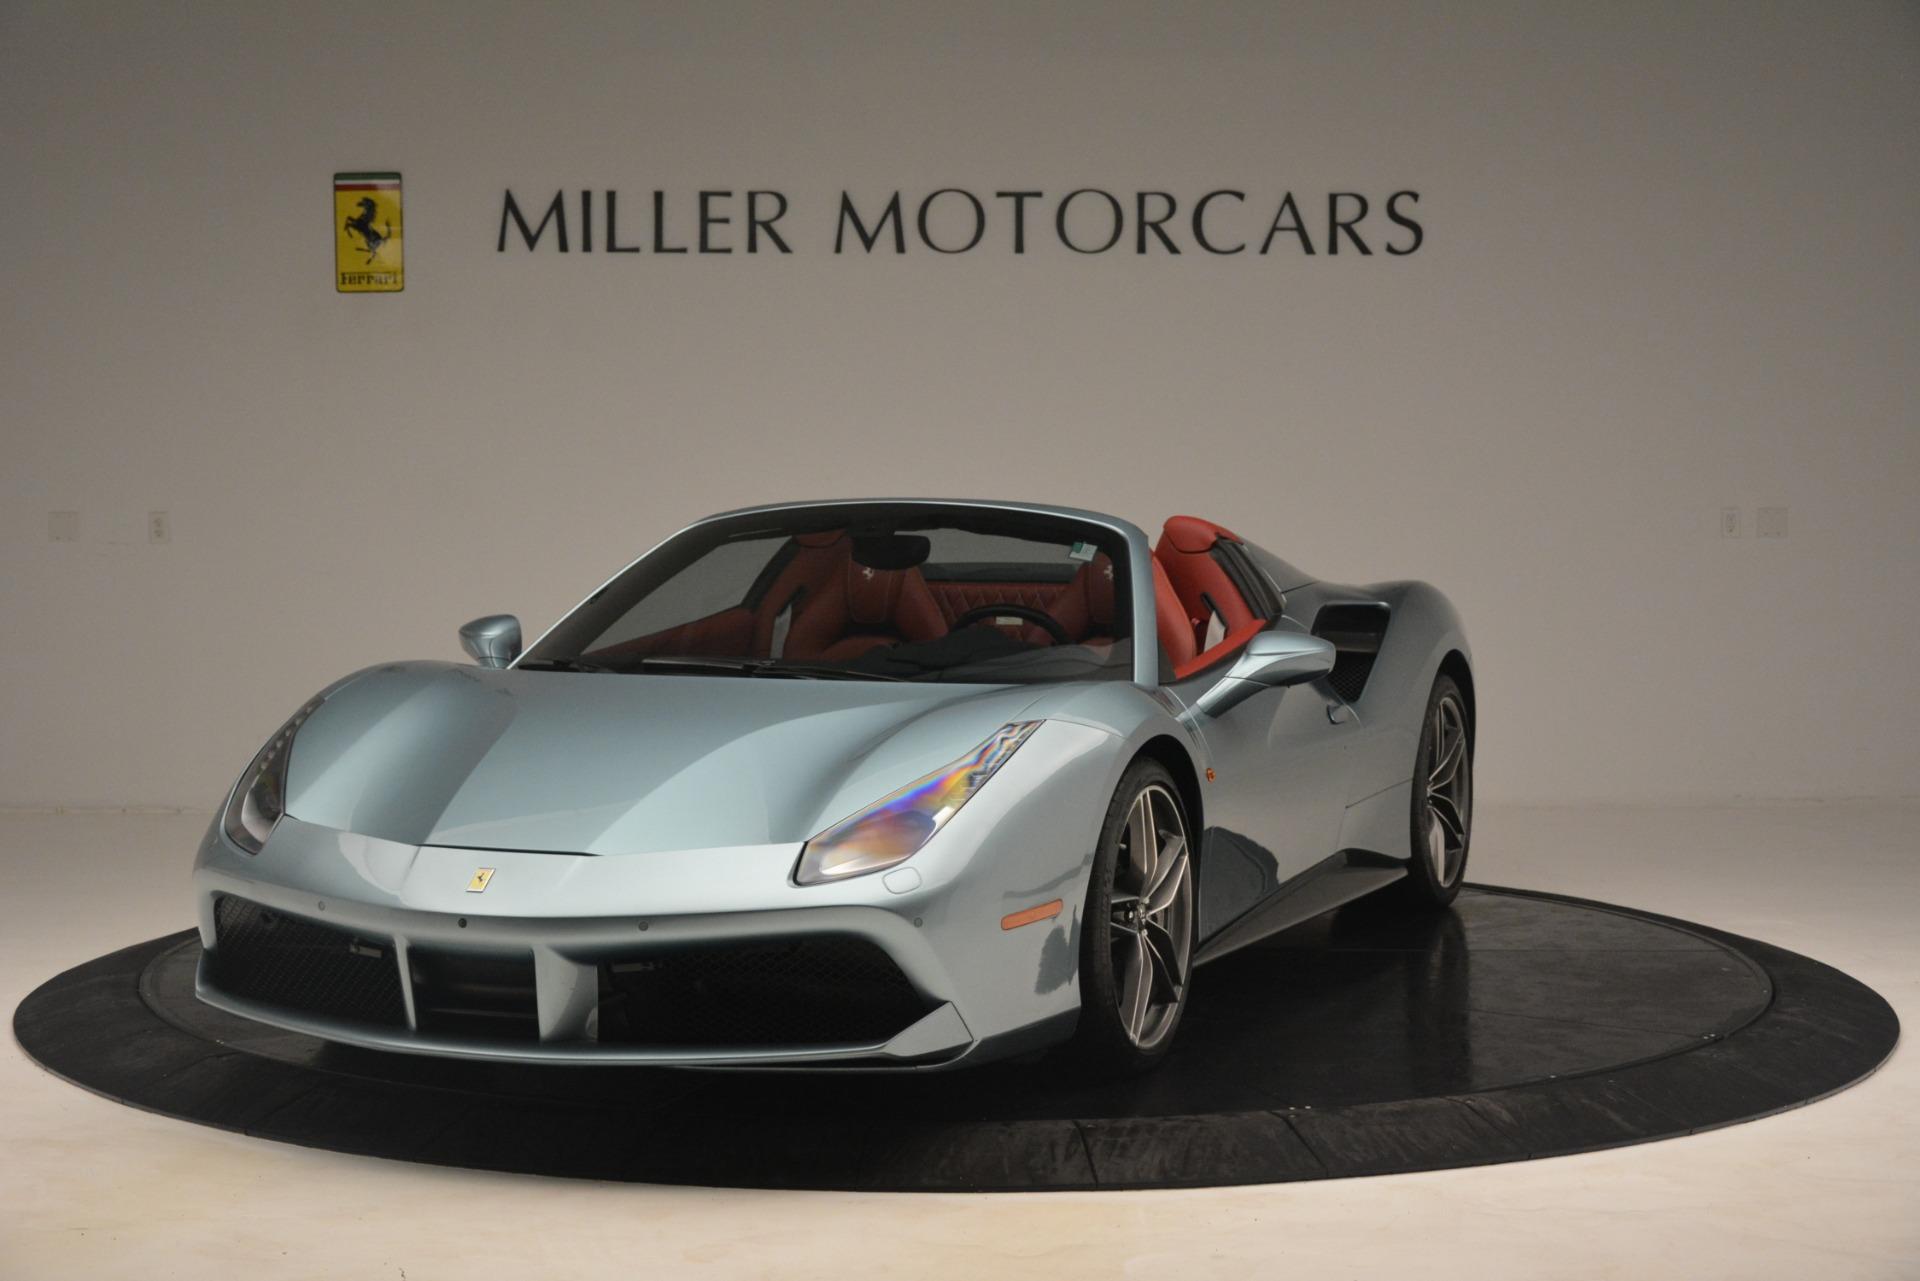 Used 2017 Ferrari 488 Spider for sale Sold at Alfa Romeo of Westport in Westport CT 06880 1